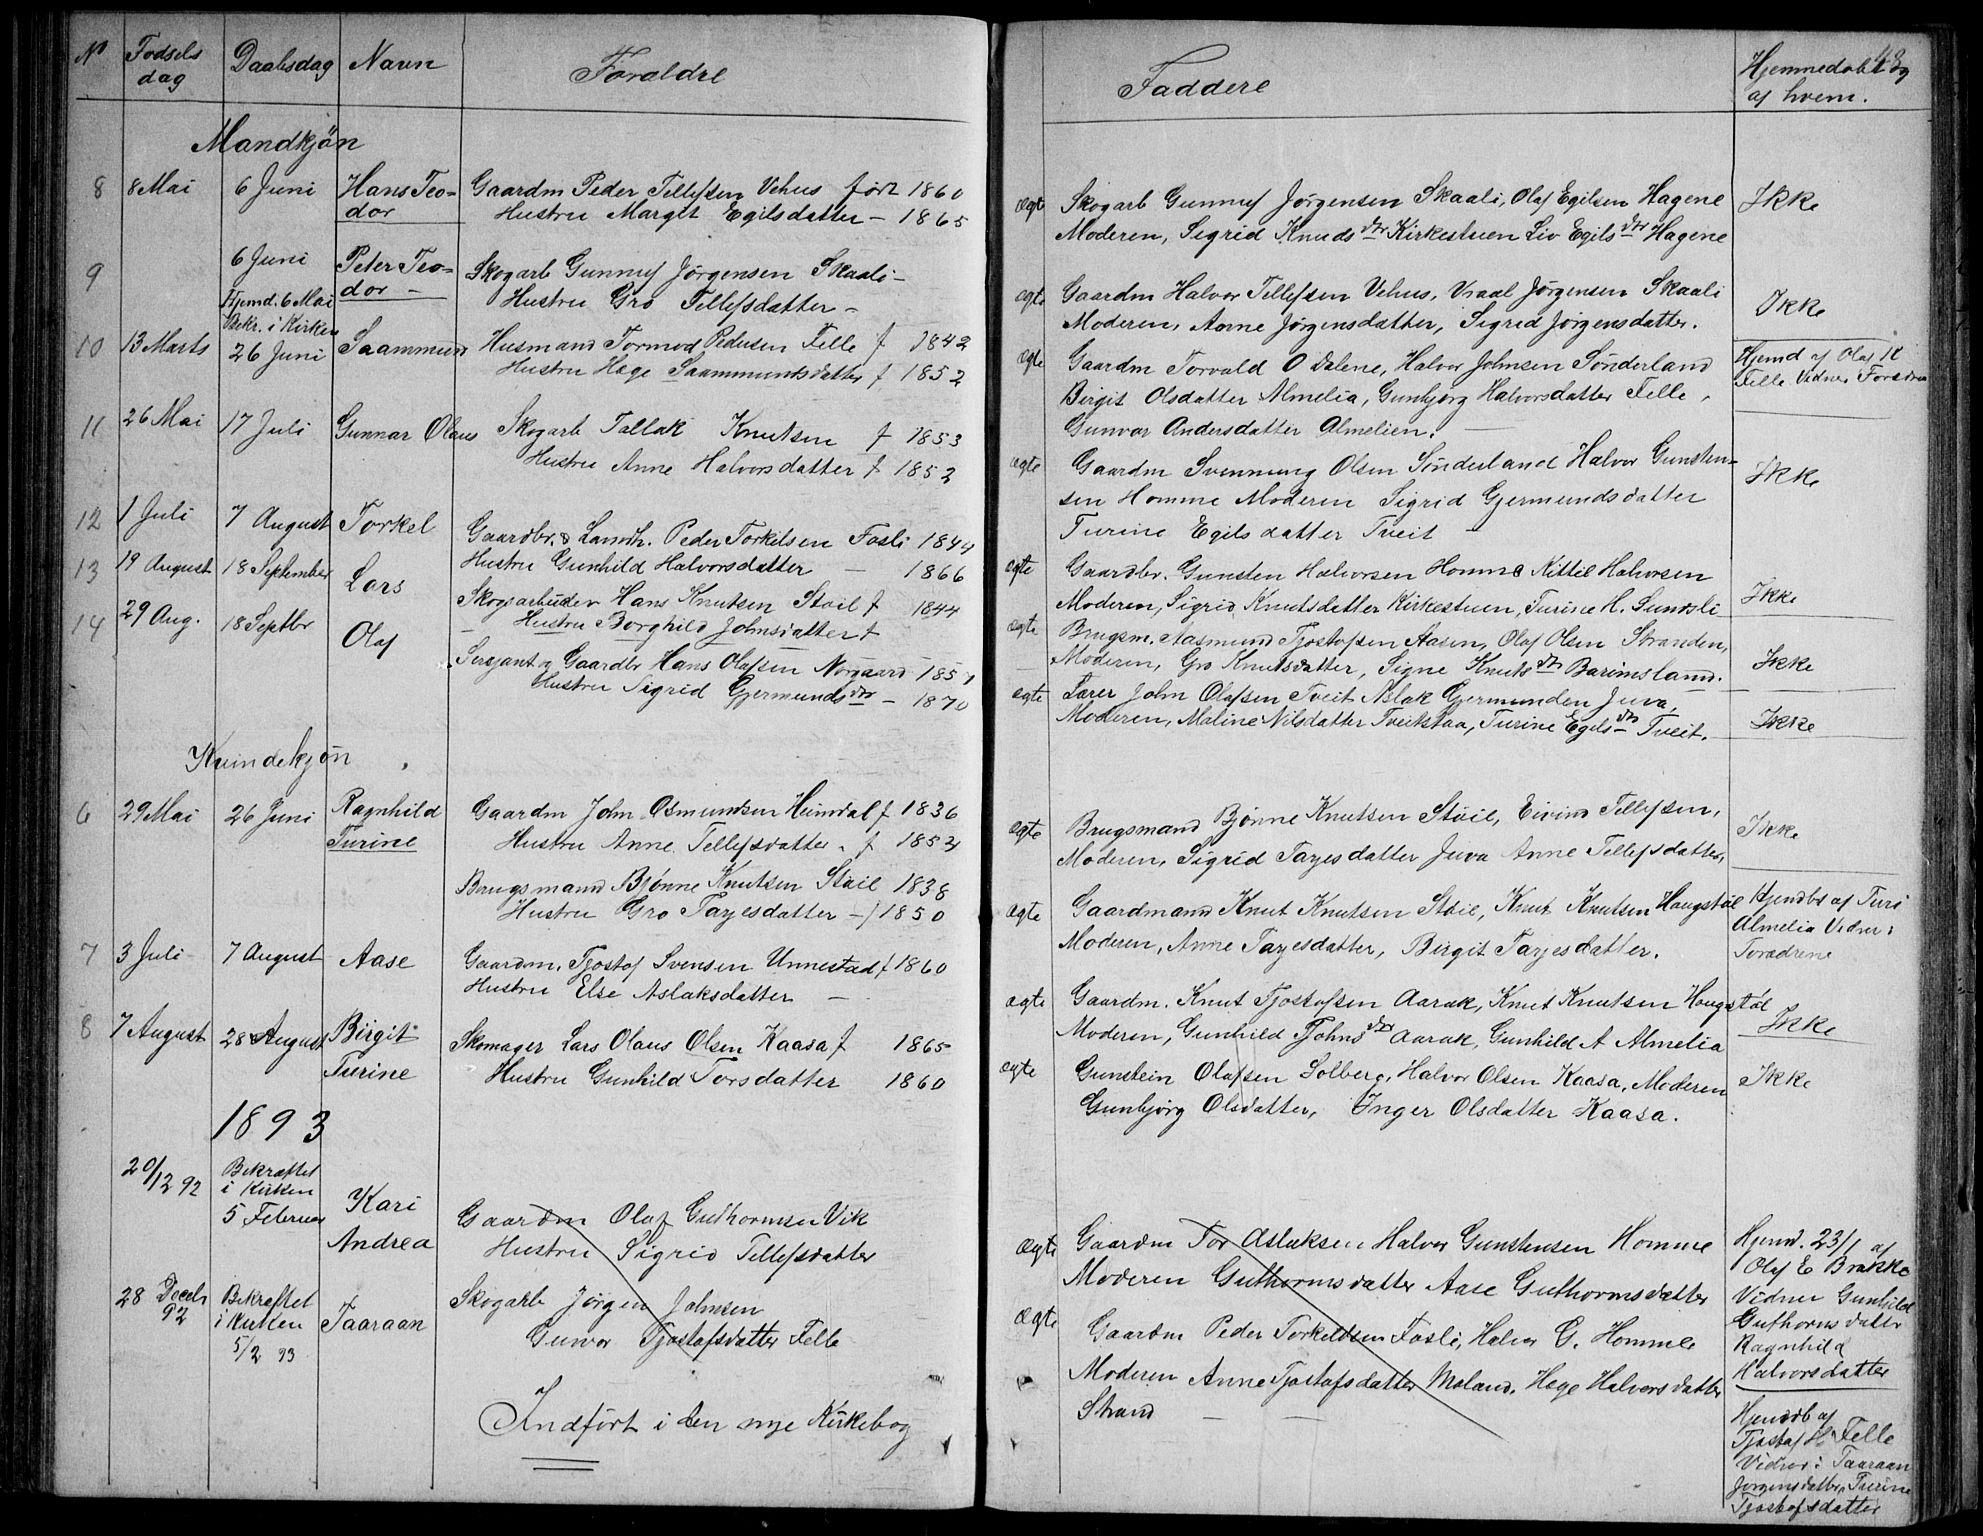 SAKO, Nissedal kirkebøker, G/Gb/L0002: Klokkerbok nr. II 2, 1863-1892, s. 48